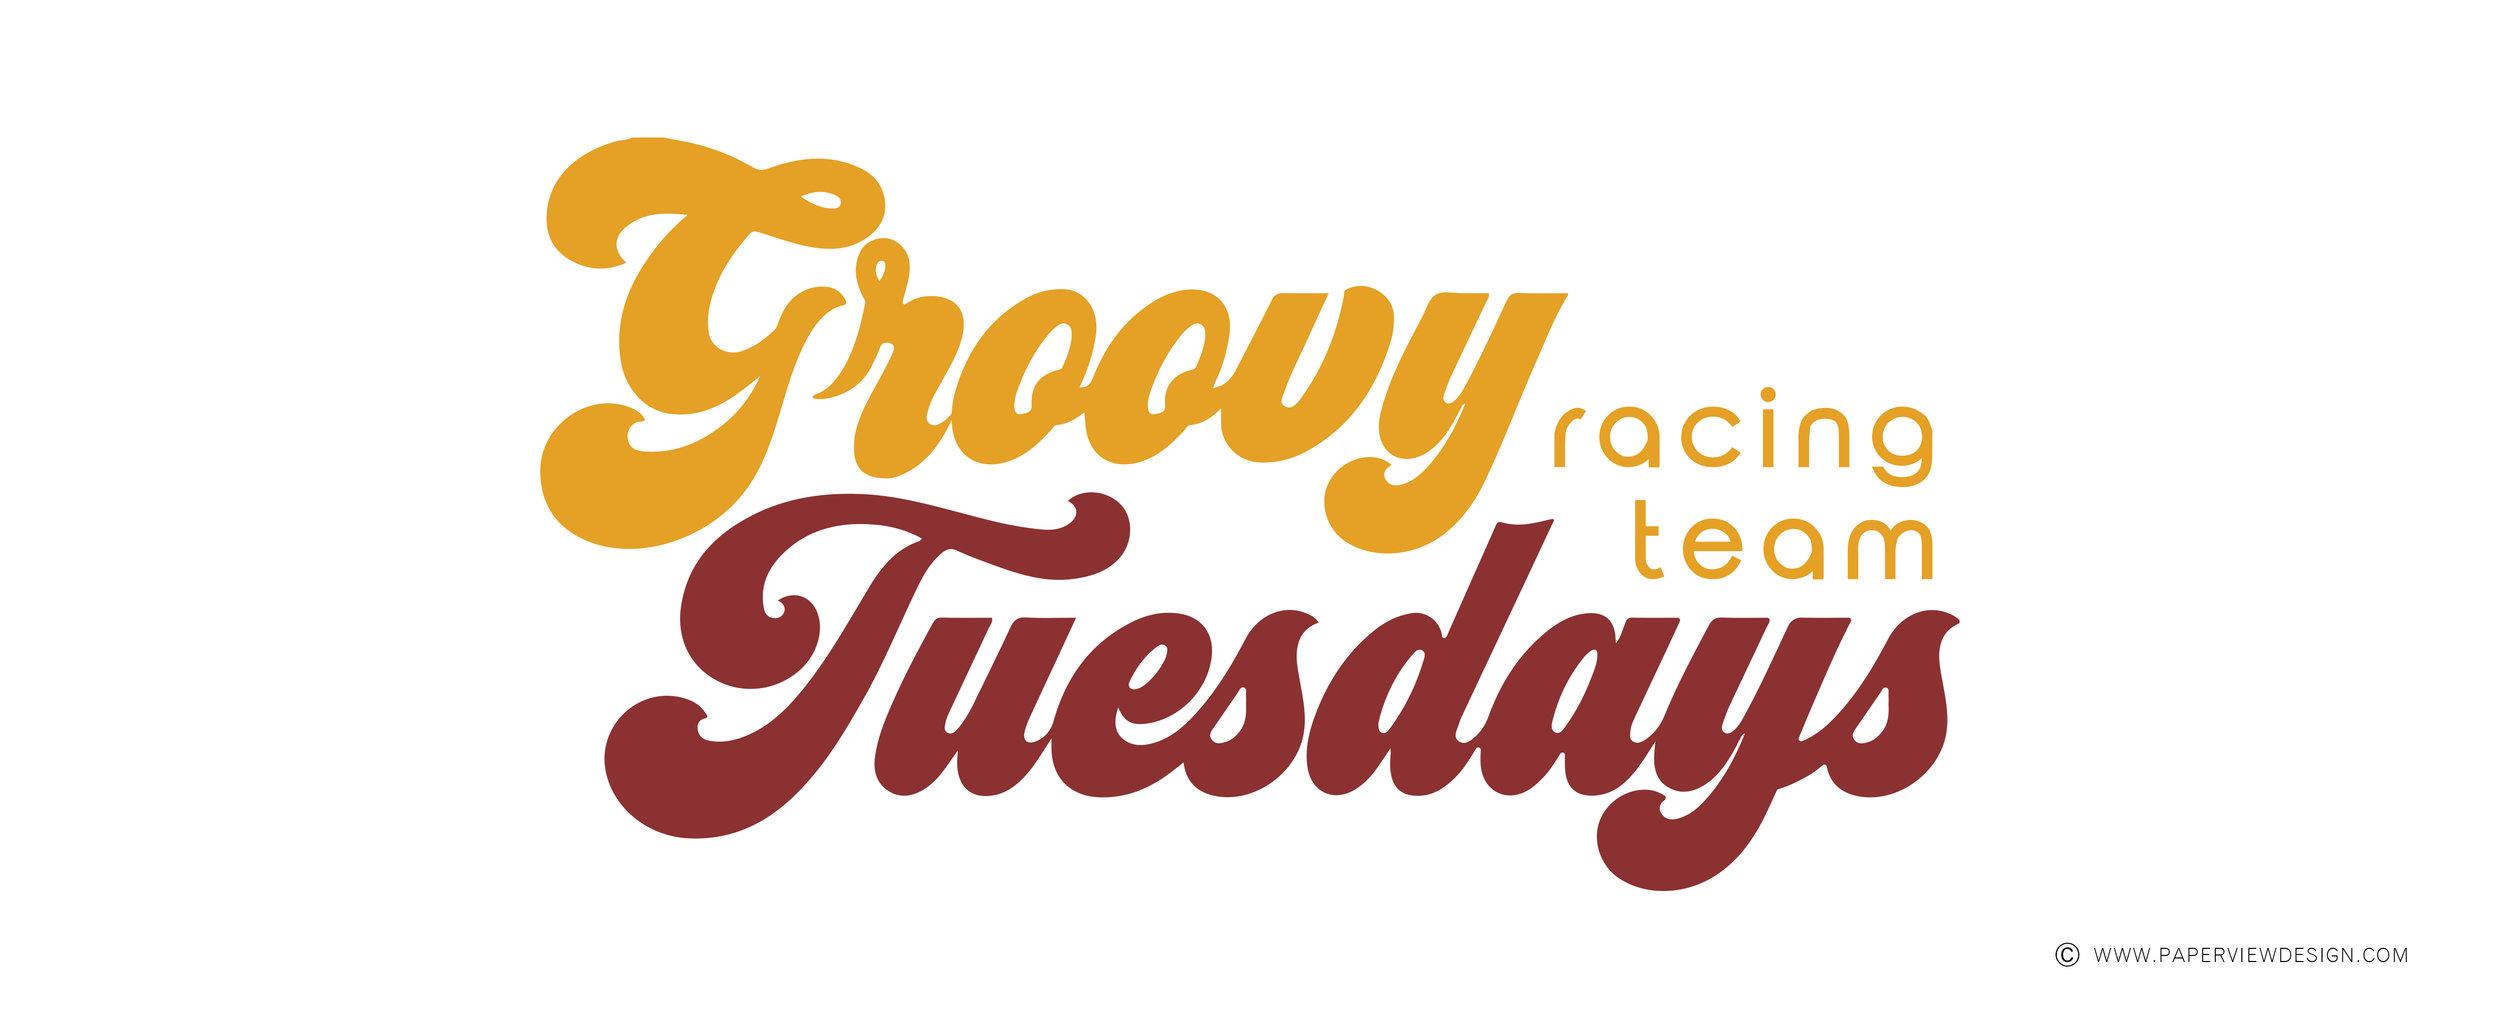 GroovyTuesdays-logo-website.jpg